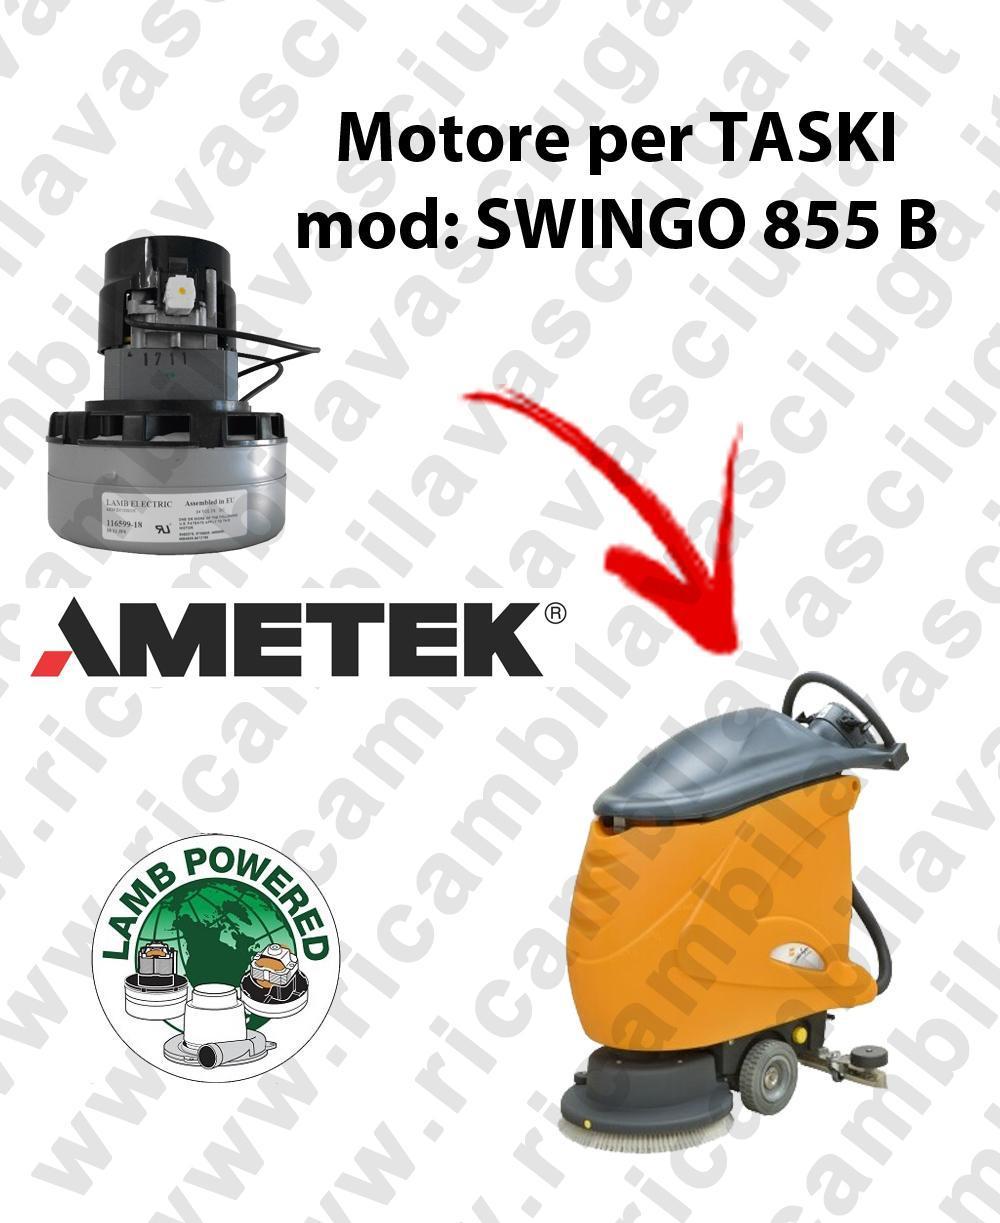 SWINGO 855 B Motore de aspiración LAMB AMETEK para fregadora TASKI